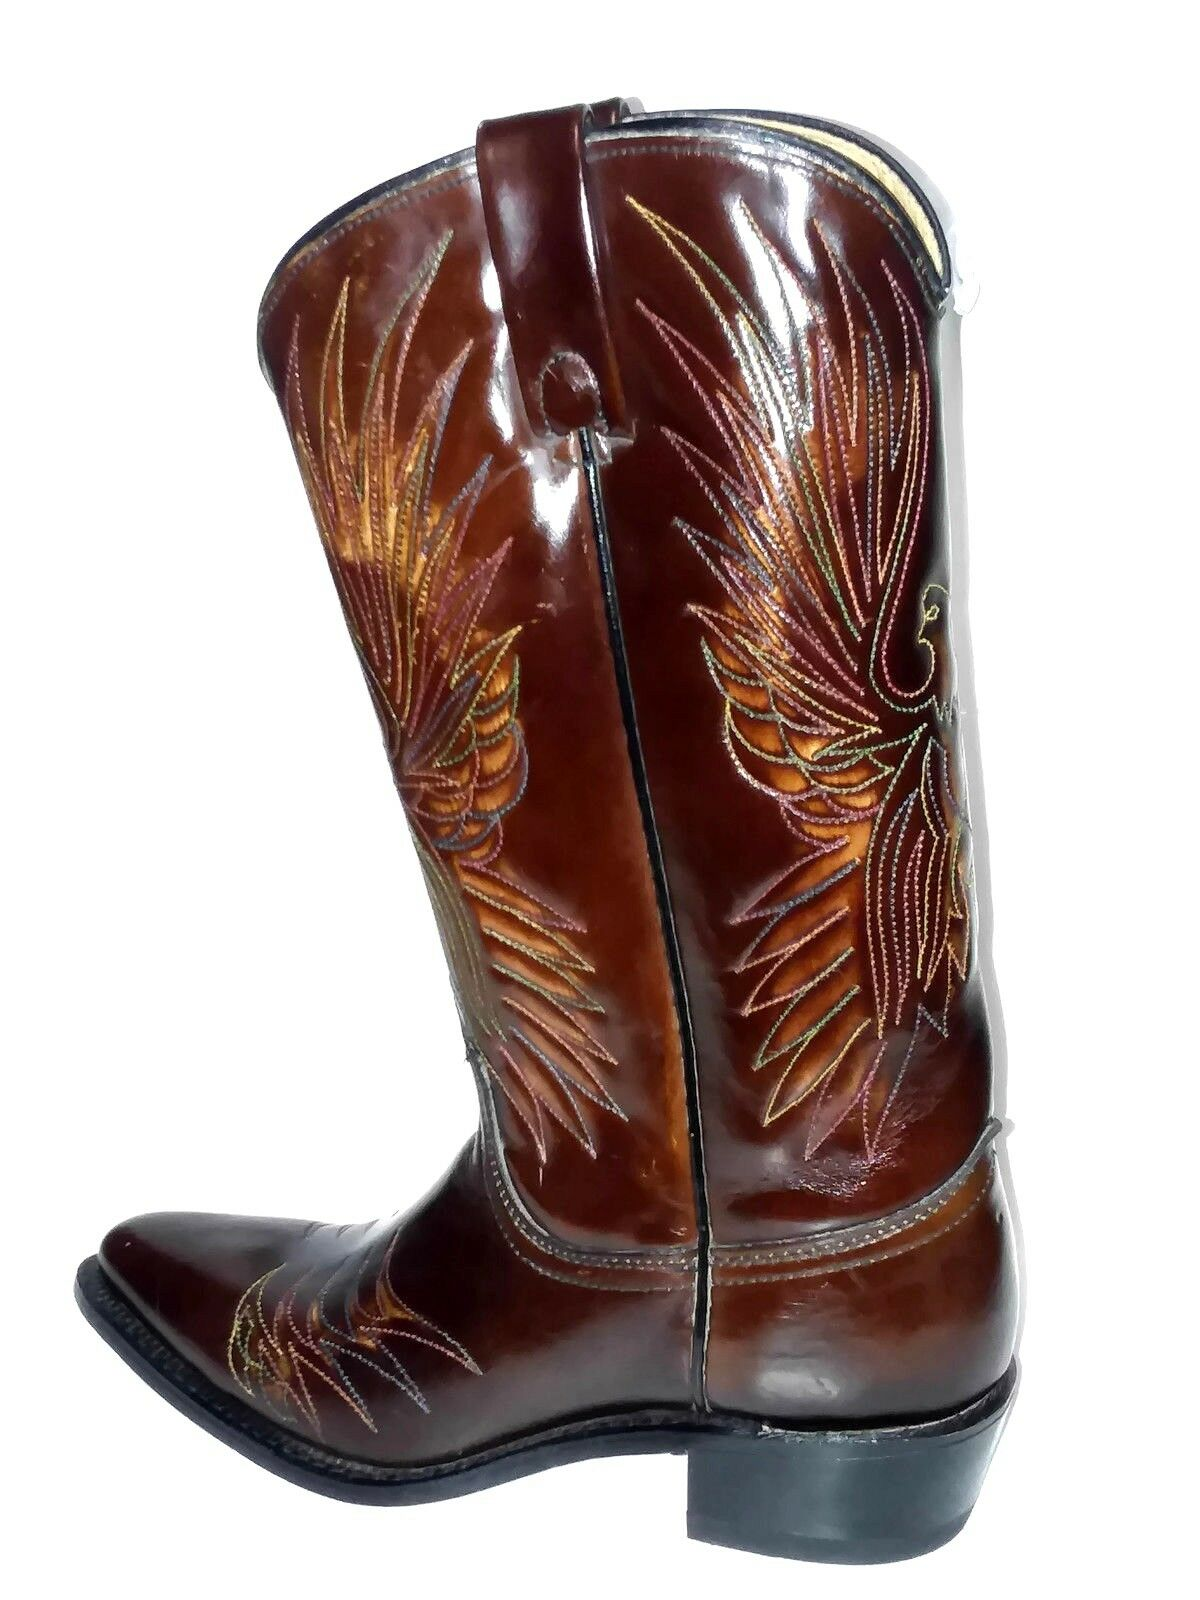 Acme Womens Vintage Burgundy Leather Western Cowboy Boots Size 5 1 2 C